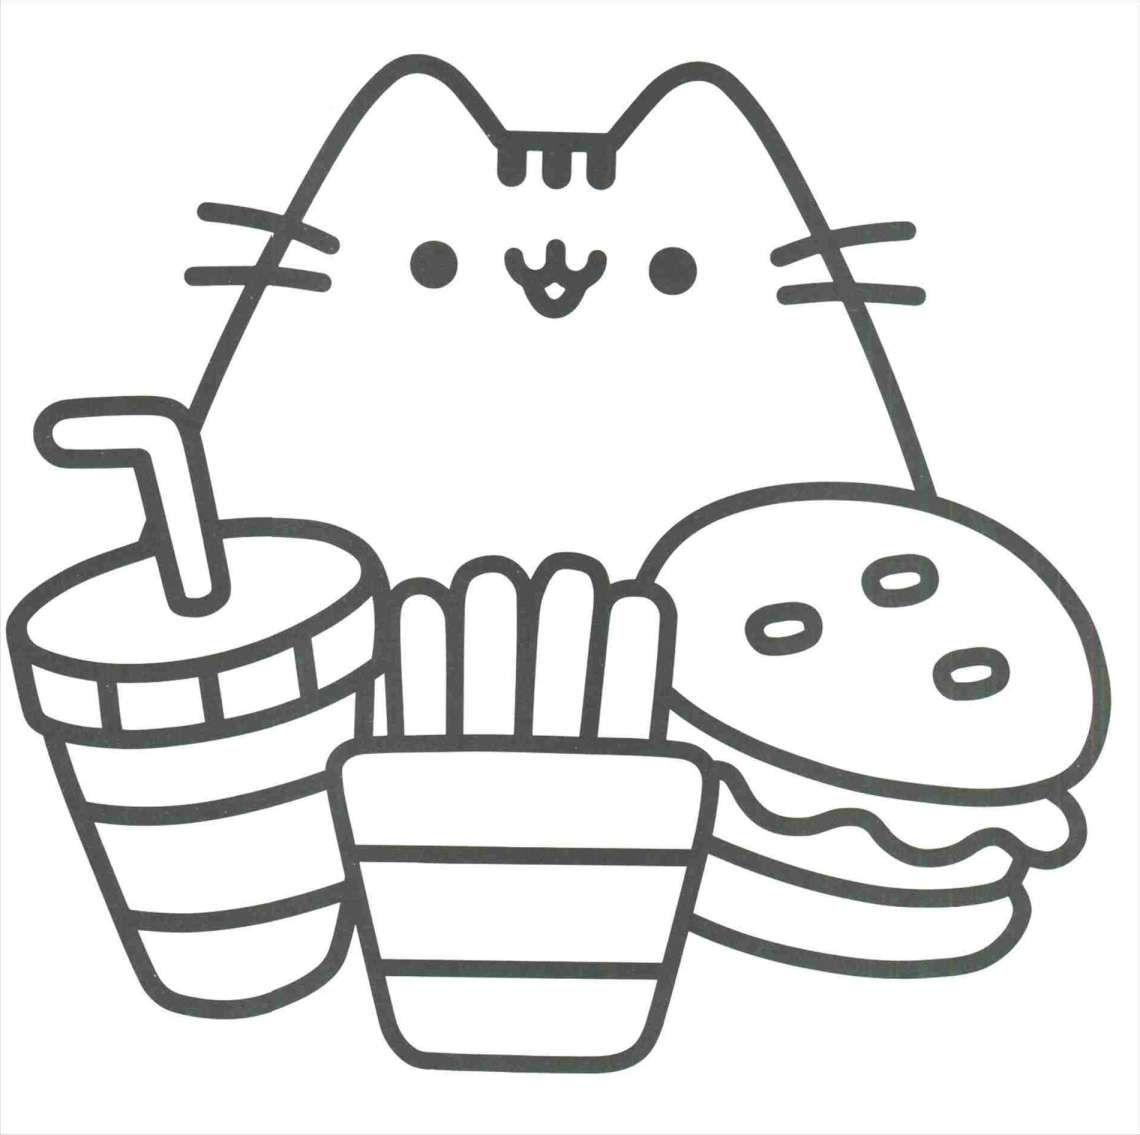 10 Cute Best Friend Drawing Whit No Color Pusheen Kleurplaten Bullet Journal Ideeen